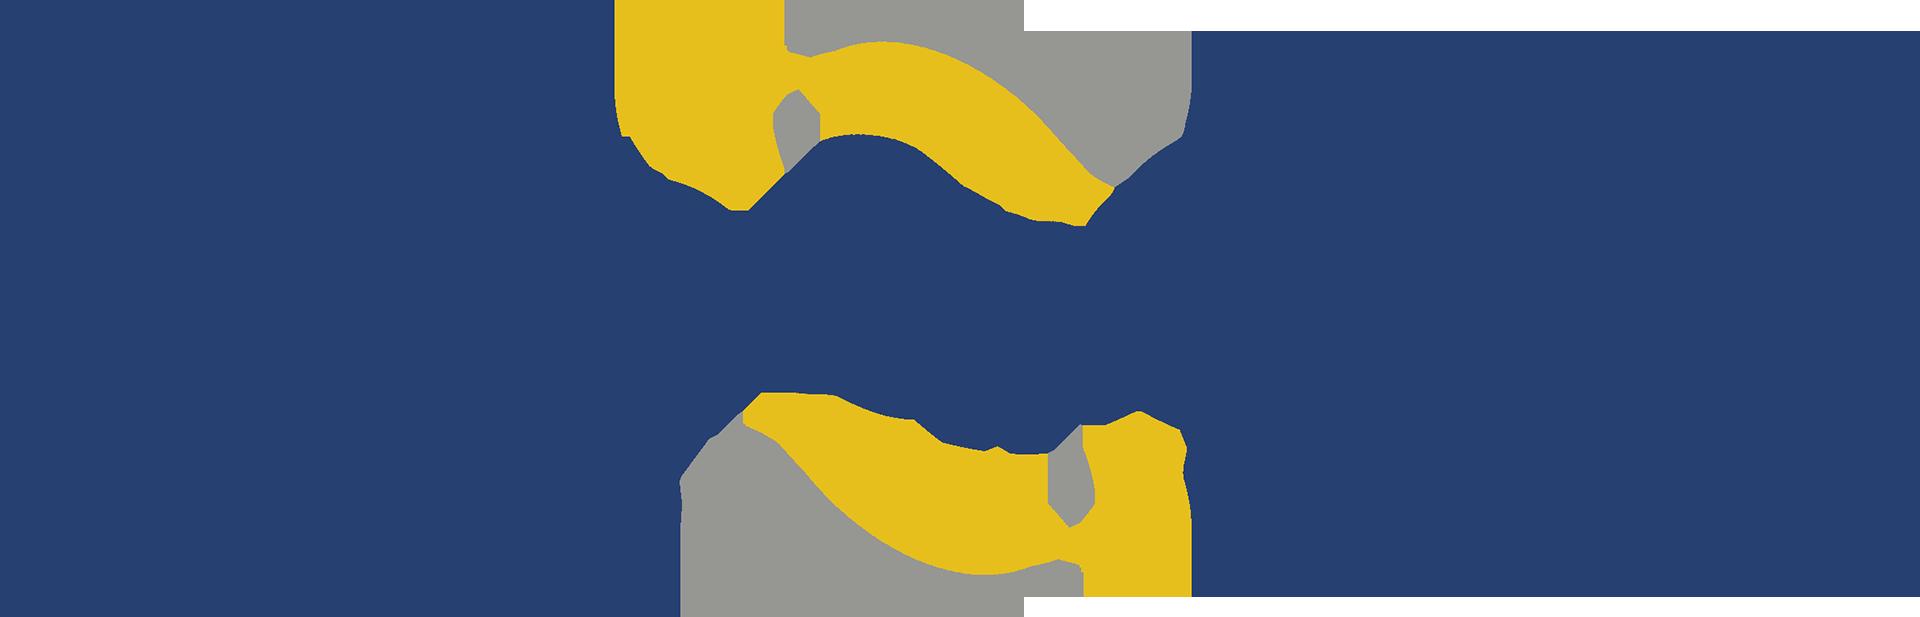 Return on Science logo